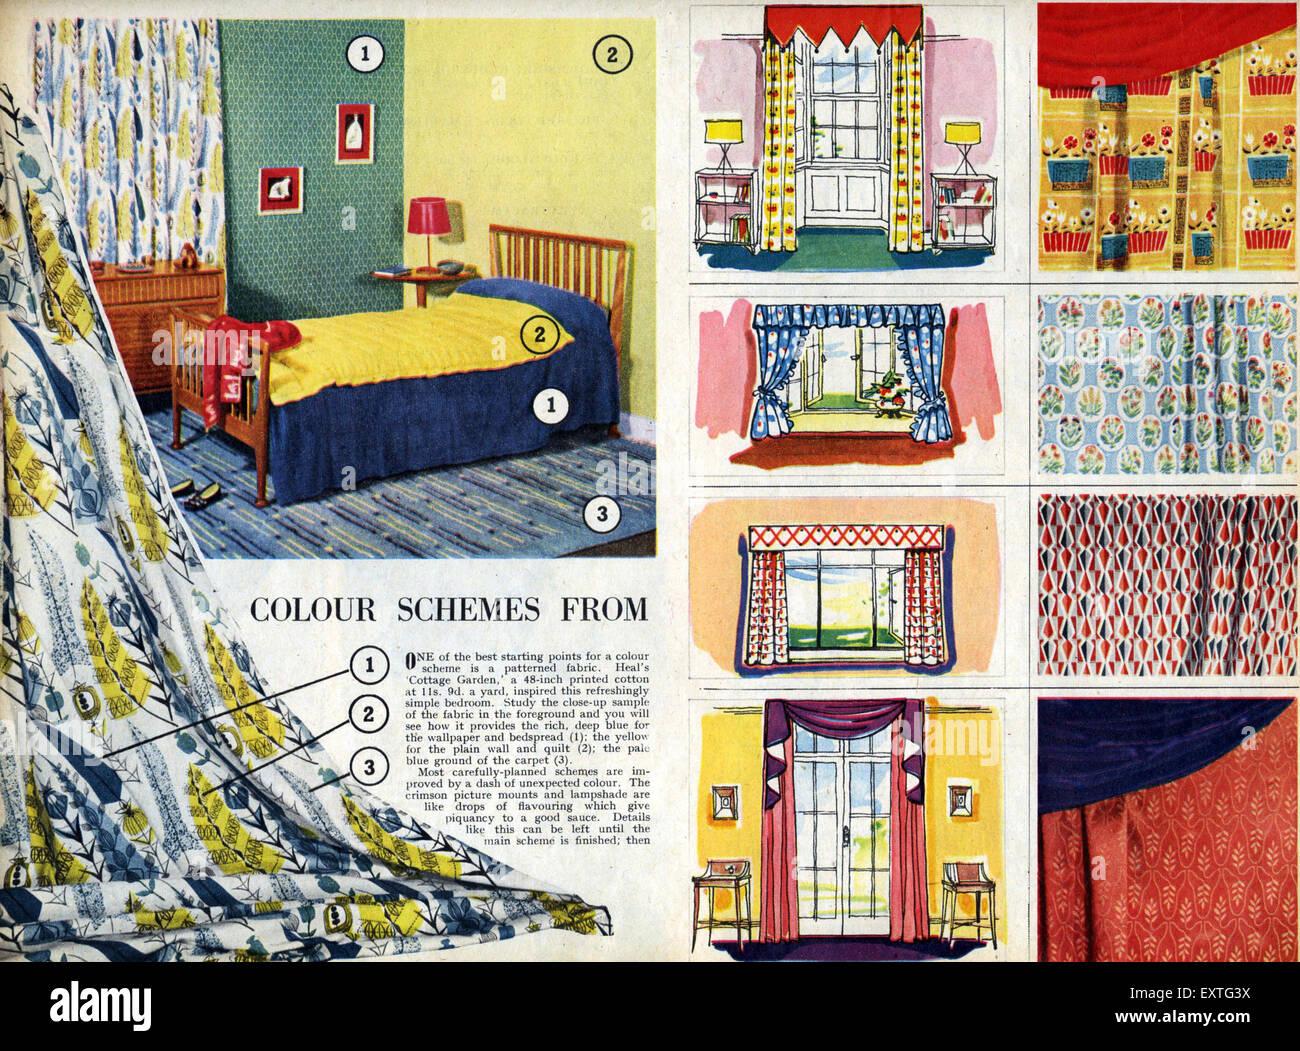 1950s Uk Home Decorating Magazine Stock Photos & 1950s Uk Home ...